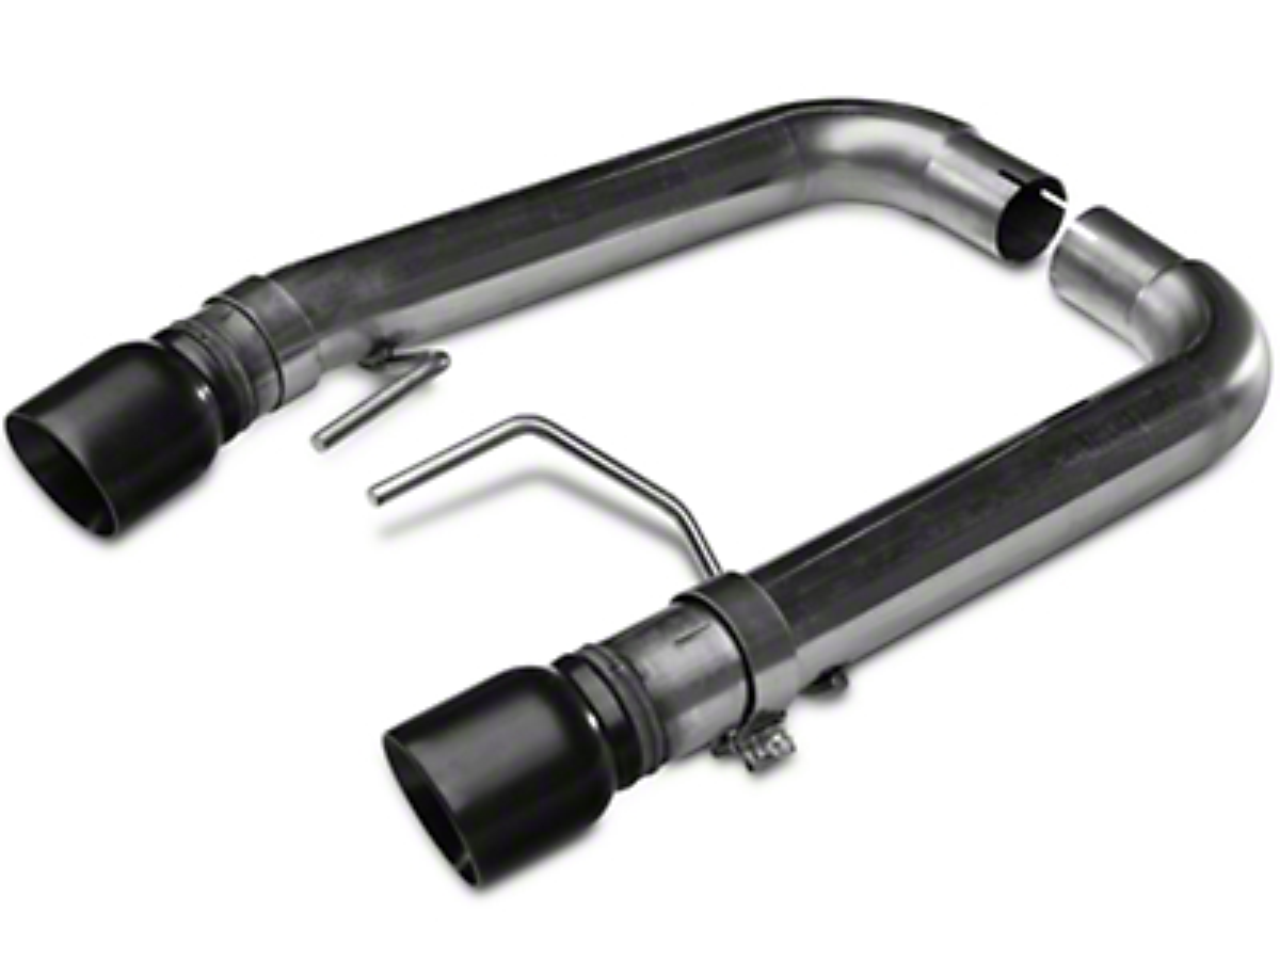 Kooks Muffler Delete Axle-Back Exhaust - Black Tips (15-17 GT Fastback)